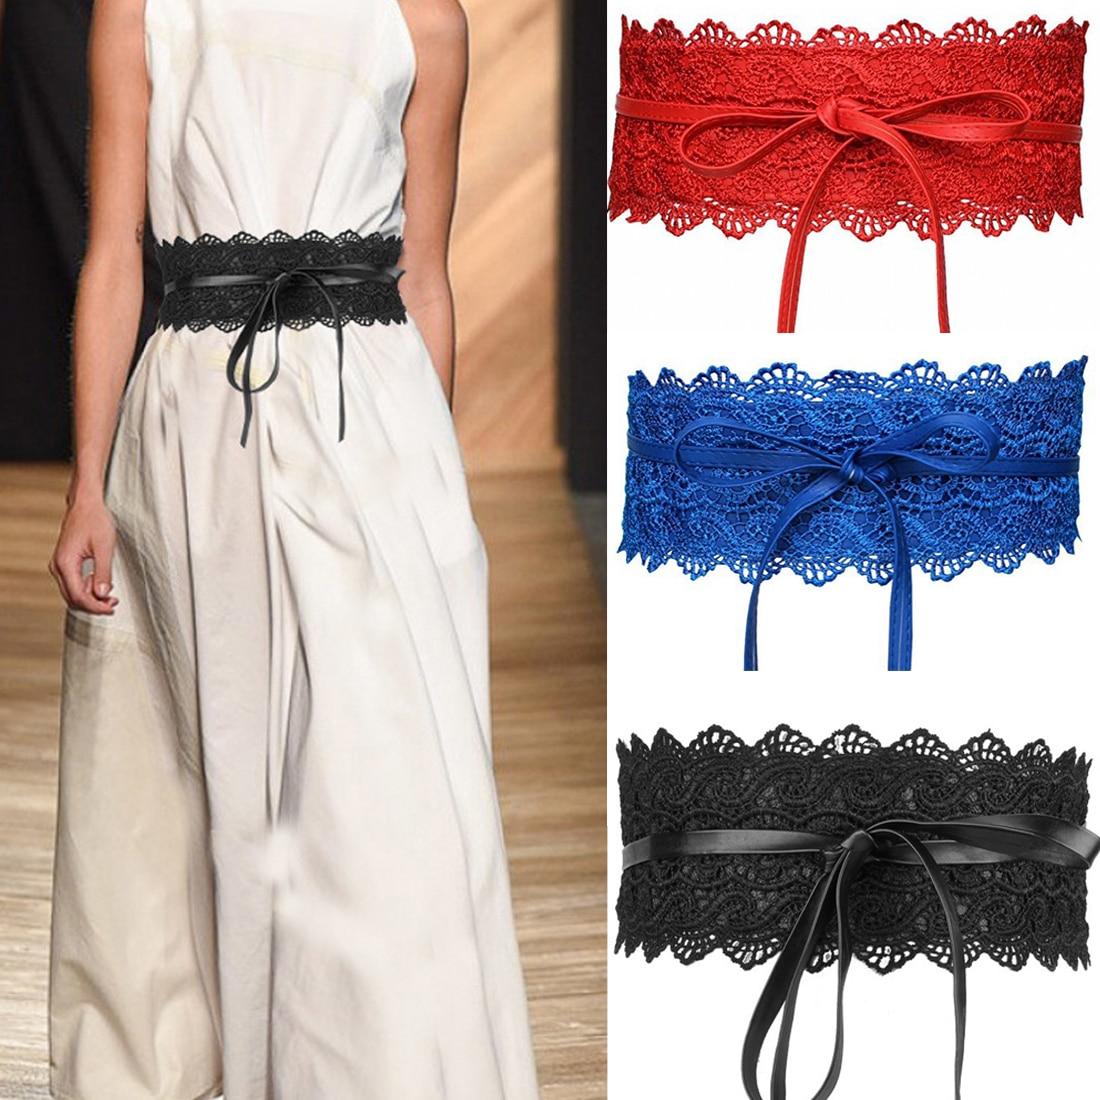 Fashion Waist Cincher Women Dress Bowknot Waist Band Faux Leather Lace Wide Decor Belt Girdle Waist Band Bandage Elegant Belts